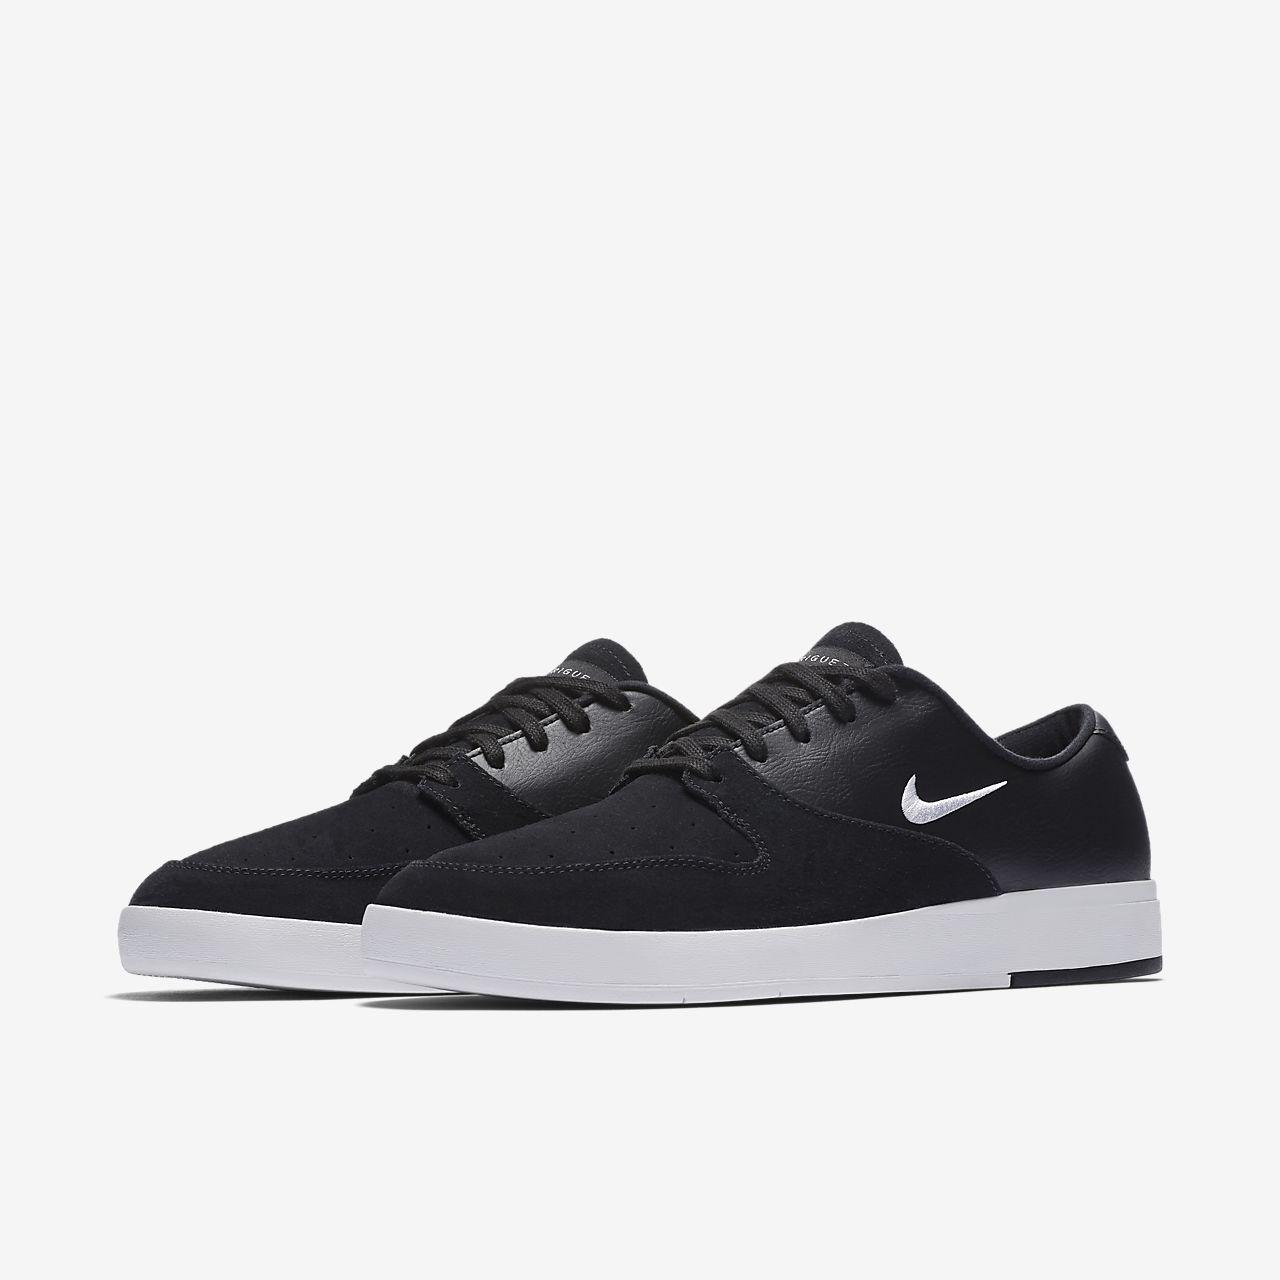 chaussure de skateboard nike sb zoom paul rodriguez ten pour homme fr. Black Bedroom Furniture Sets. Home Design Ideas